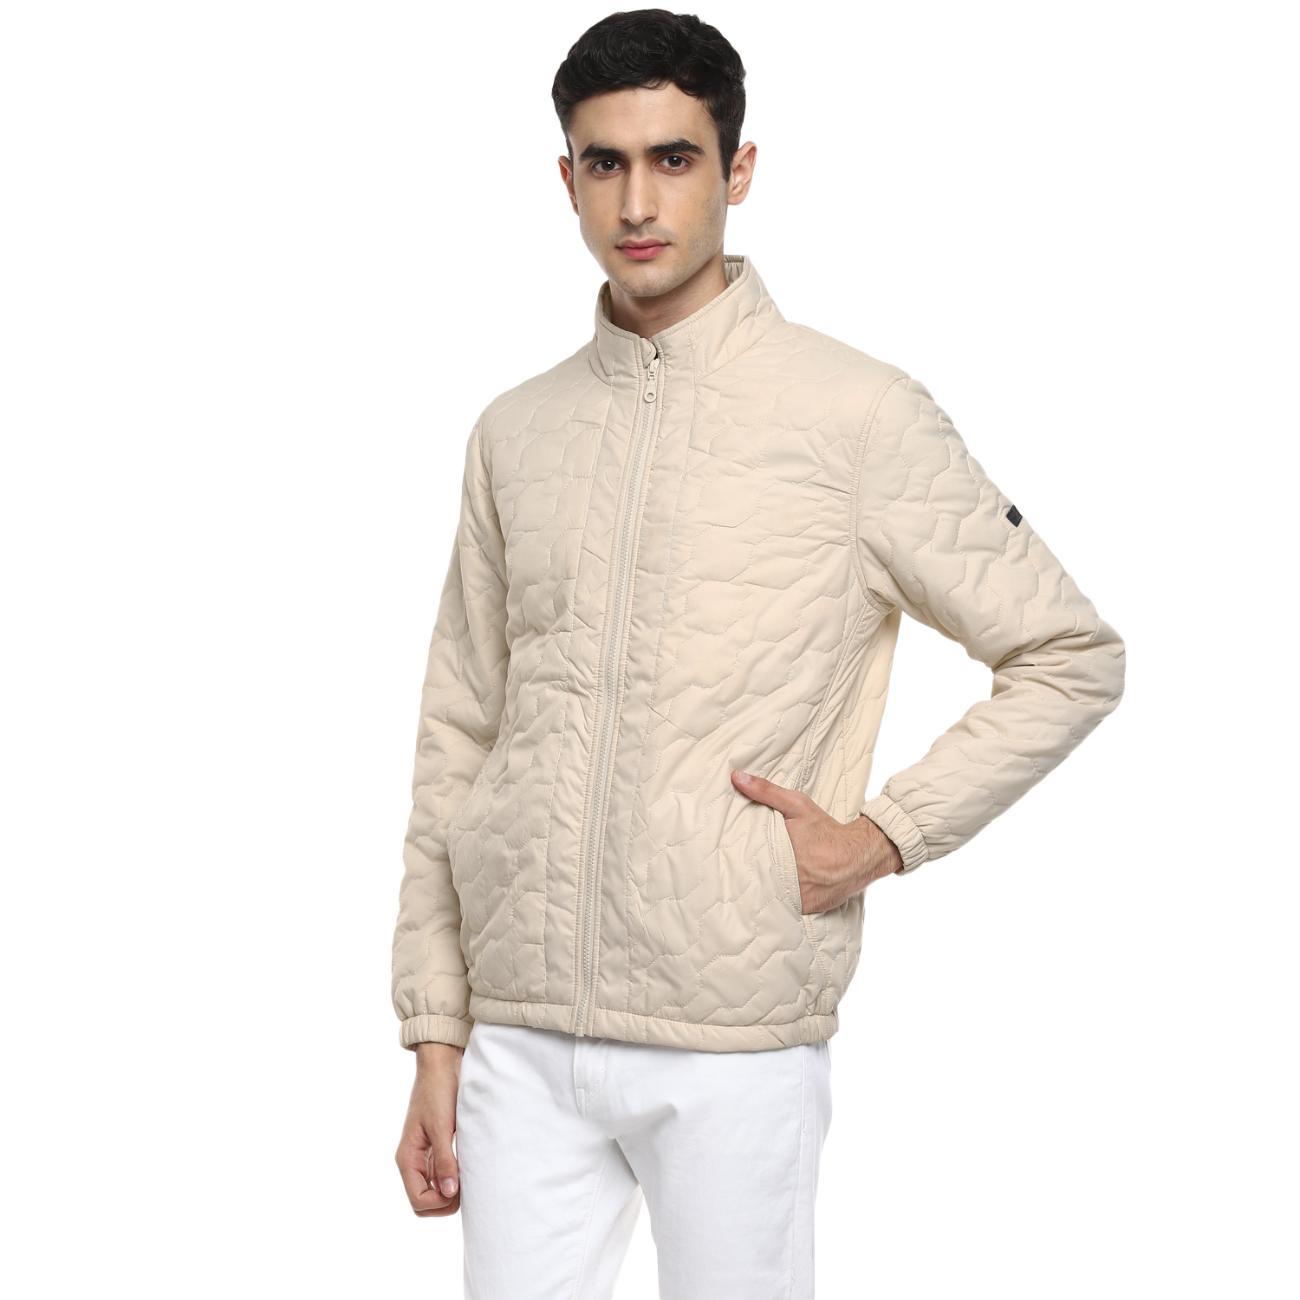 Men's Cream Jacket Online at Red Chief